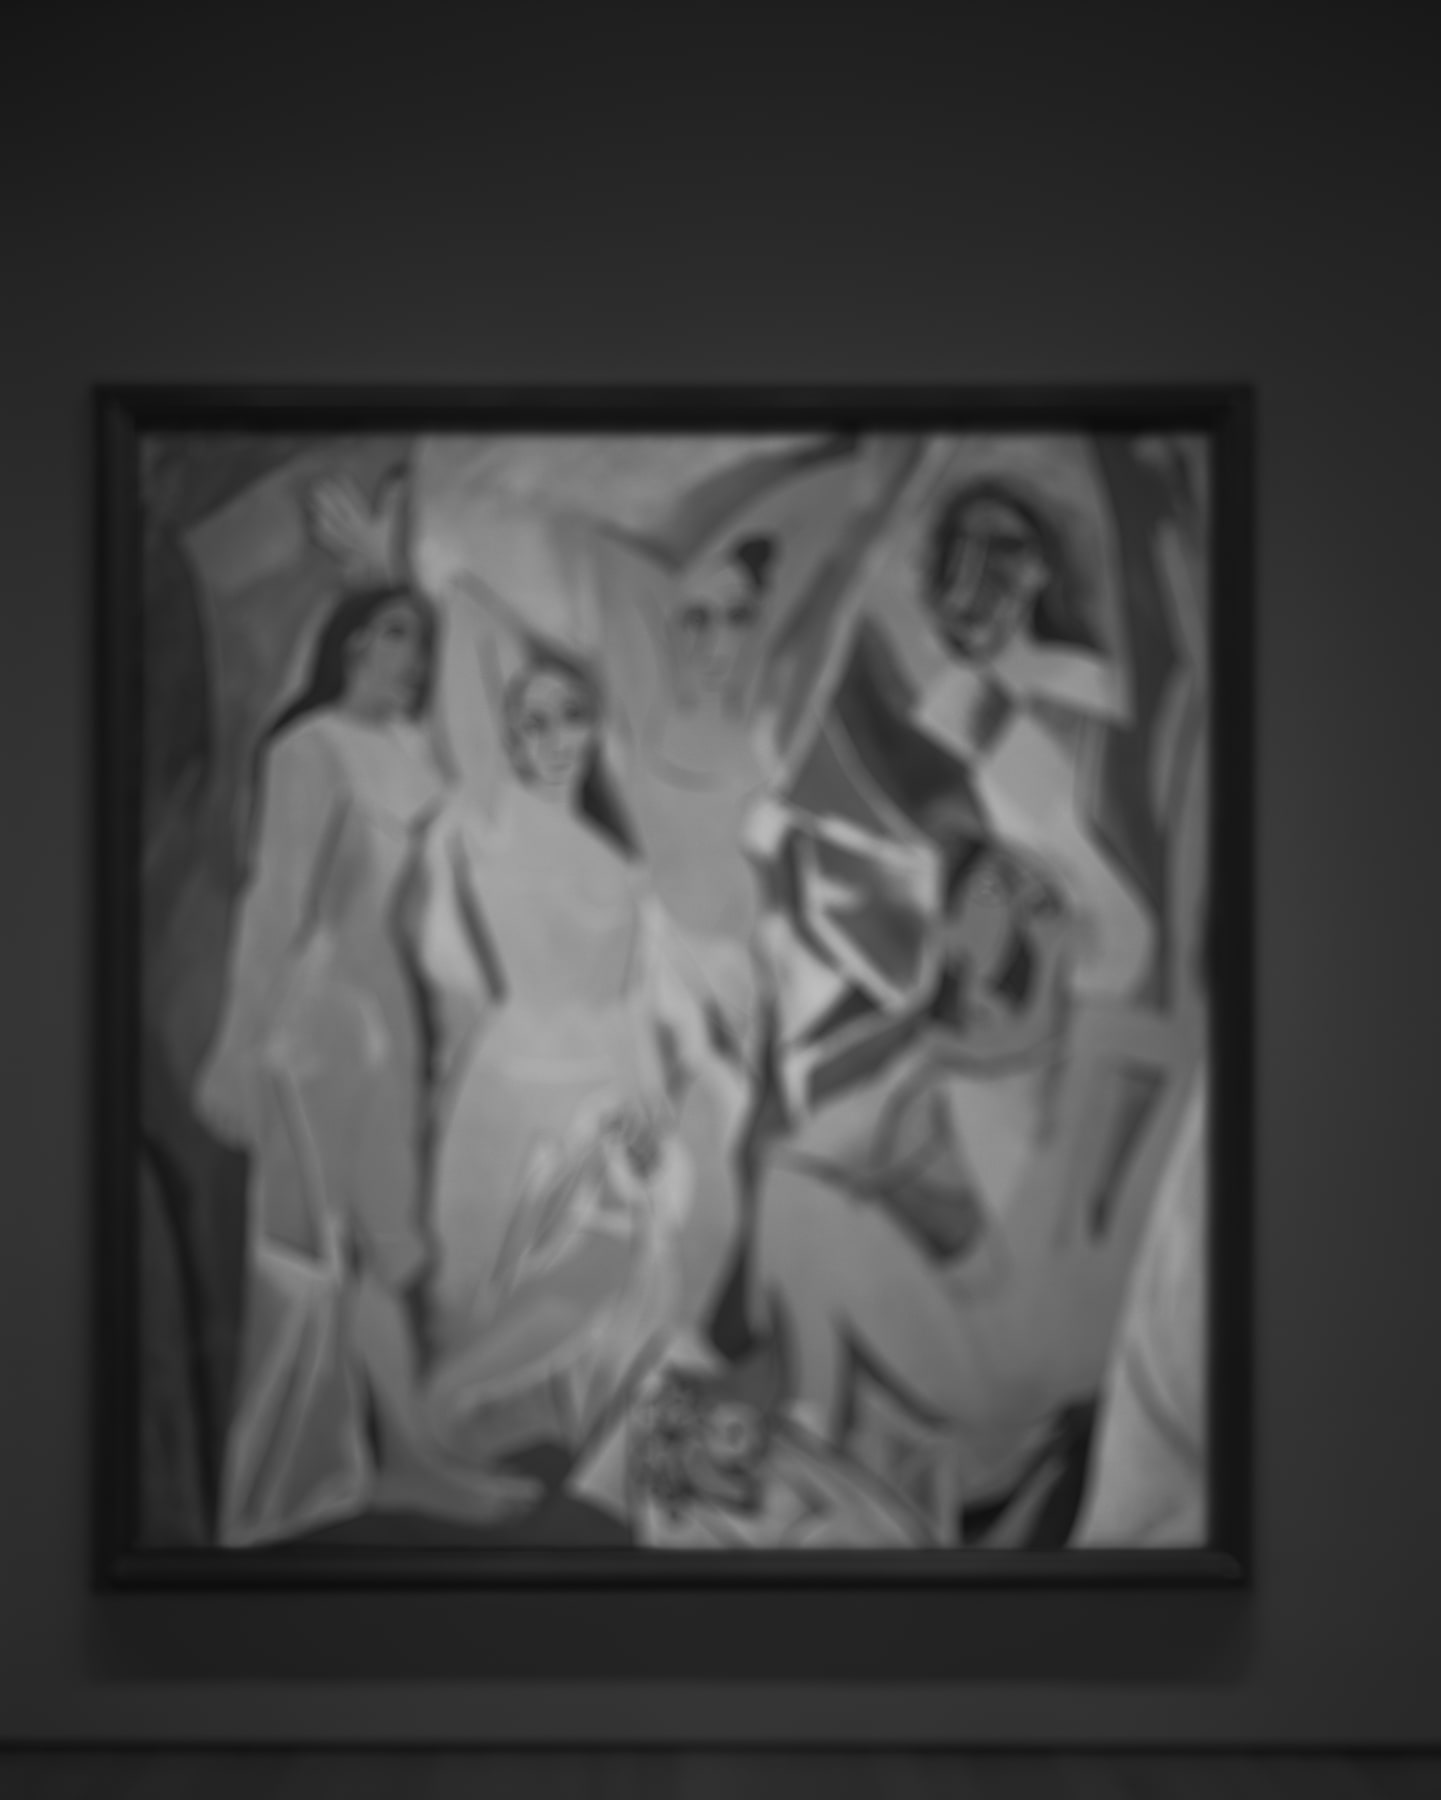 Hiroshi Sugimoto, Past Presence 060, Les Demoiselles D'Avignon, Pablo Picasso, 2014